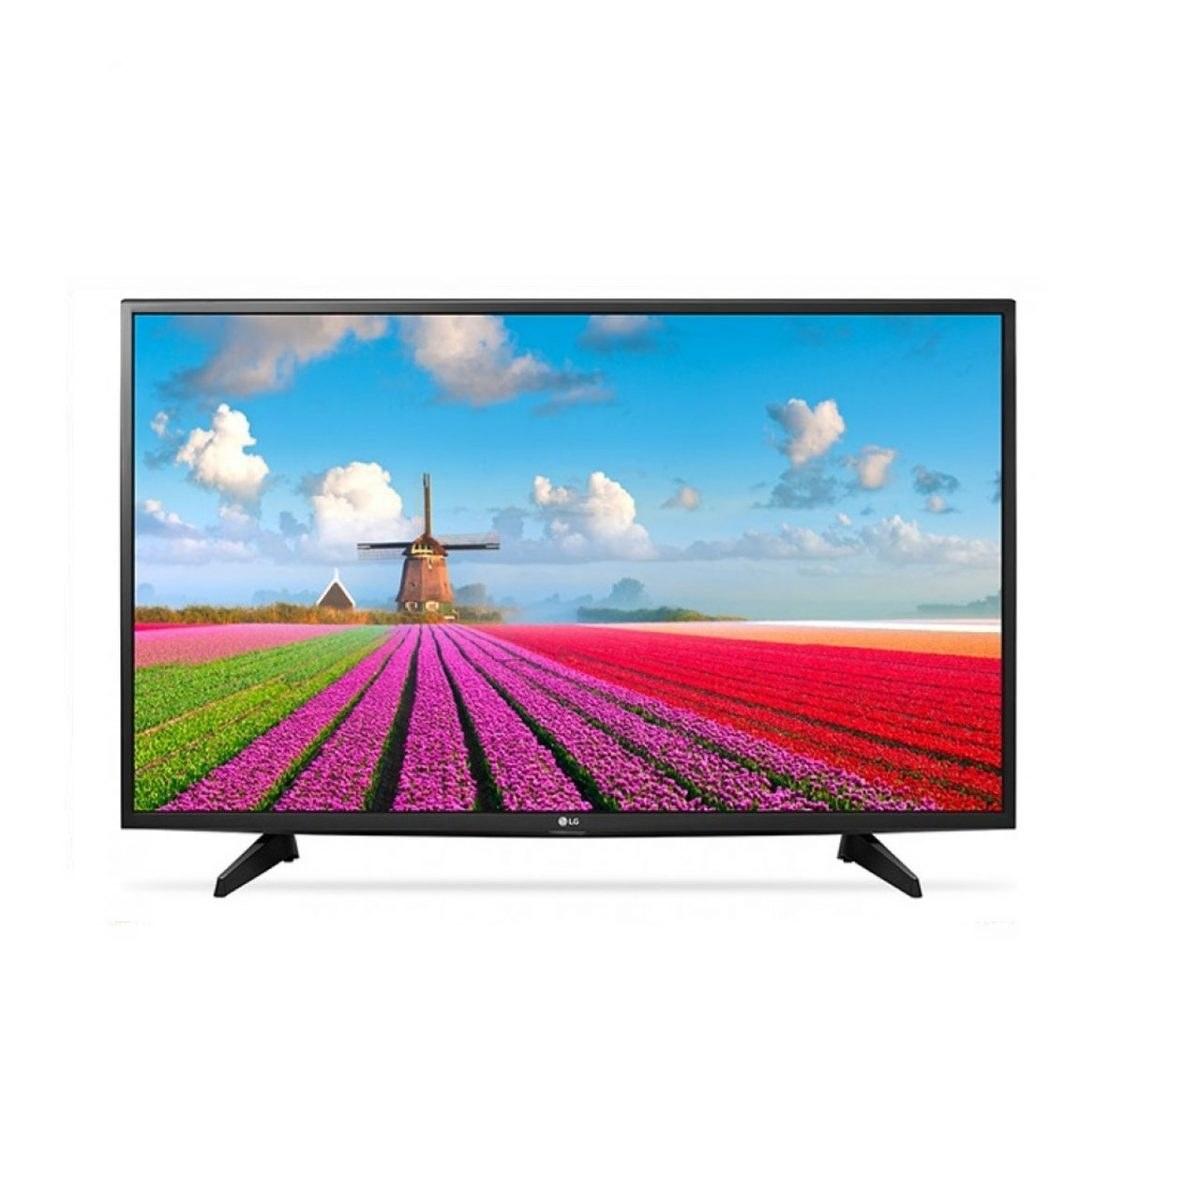 تصویر تلویزیون ال ای دی هوشمند ال جی 43 اینچ مدل 43LJ62000GI LG SMART LED HD TELEVISION 43LJ62000 GI